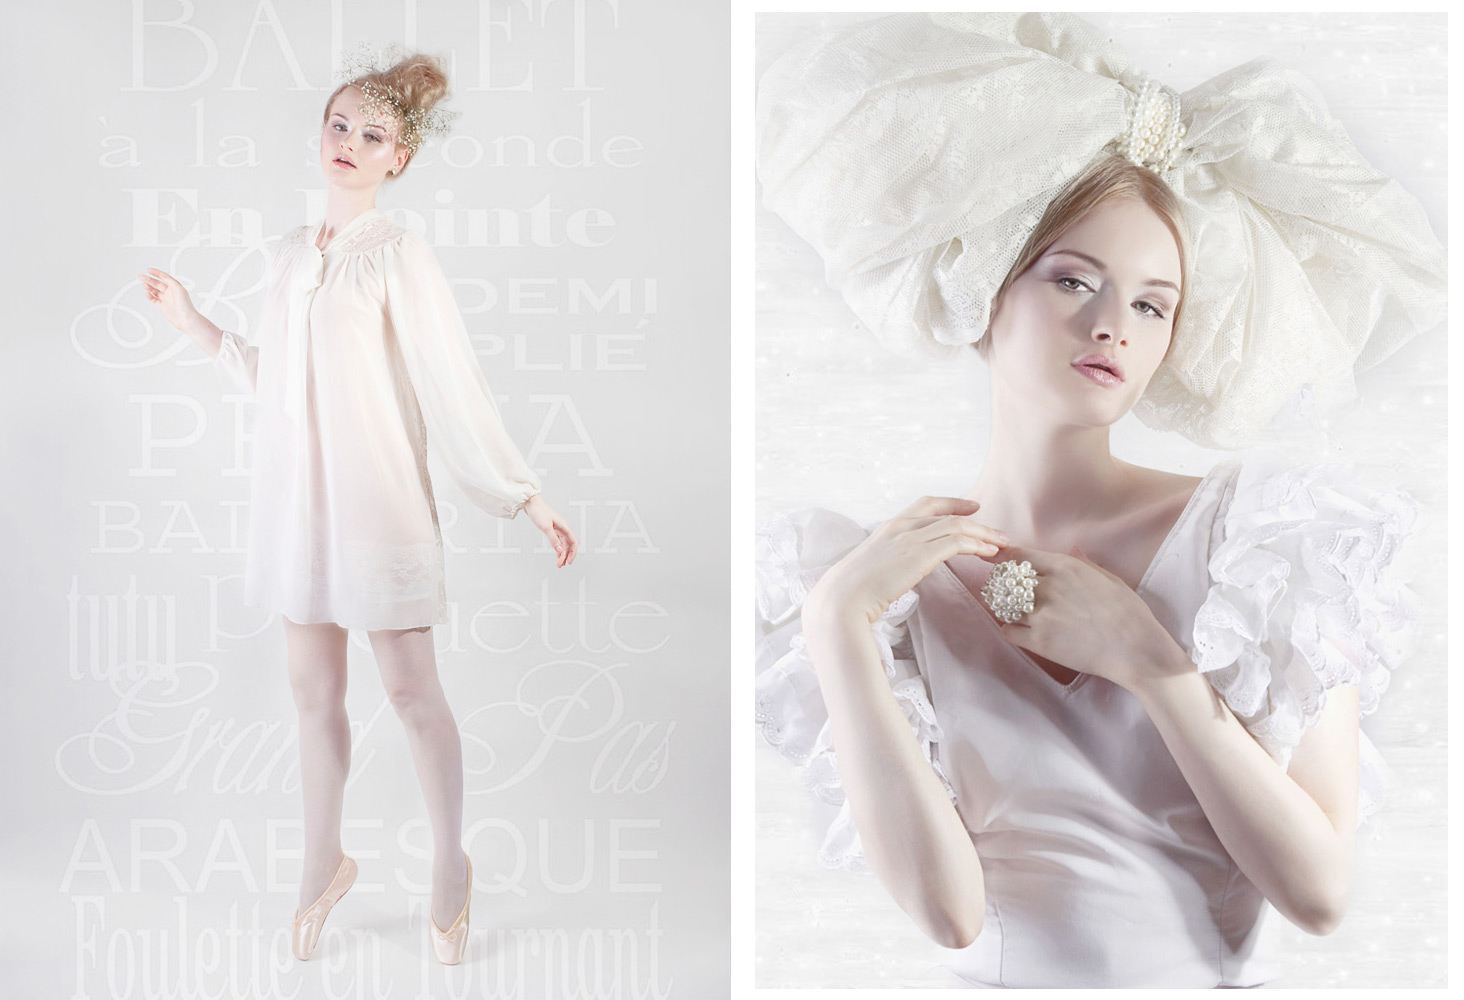 luvisa-pastell-make-up-04